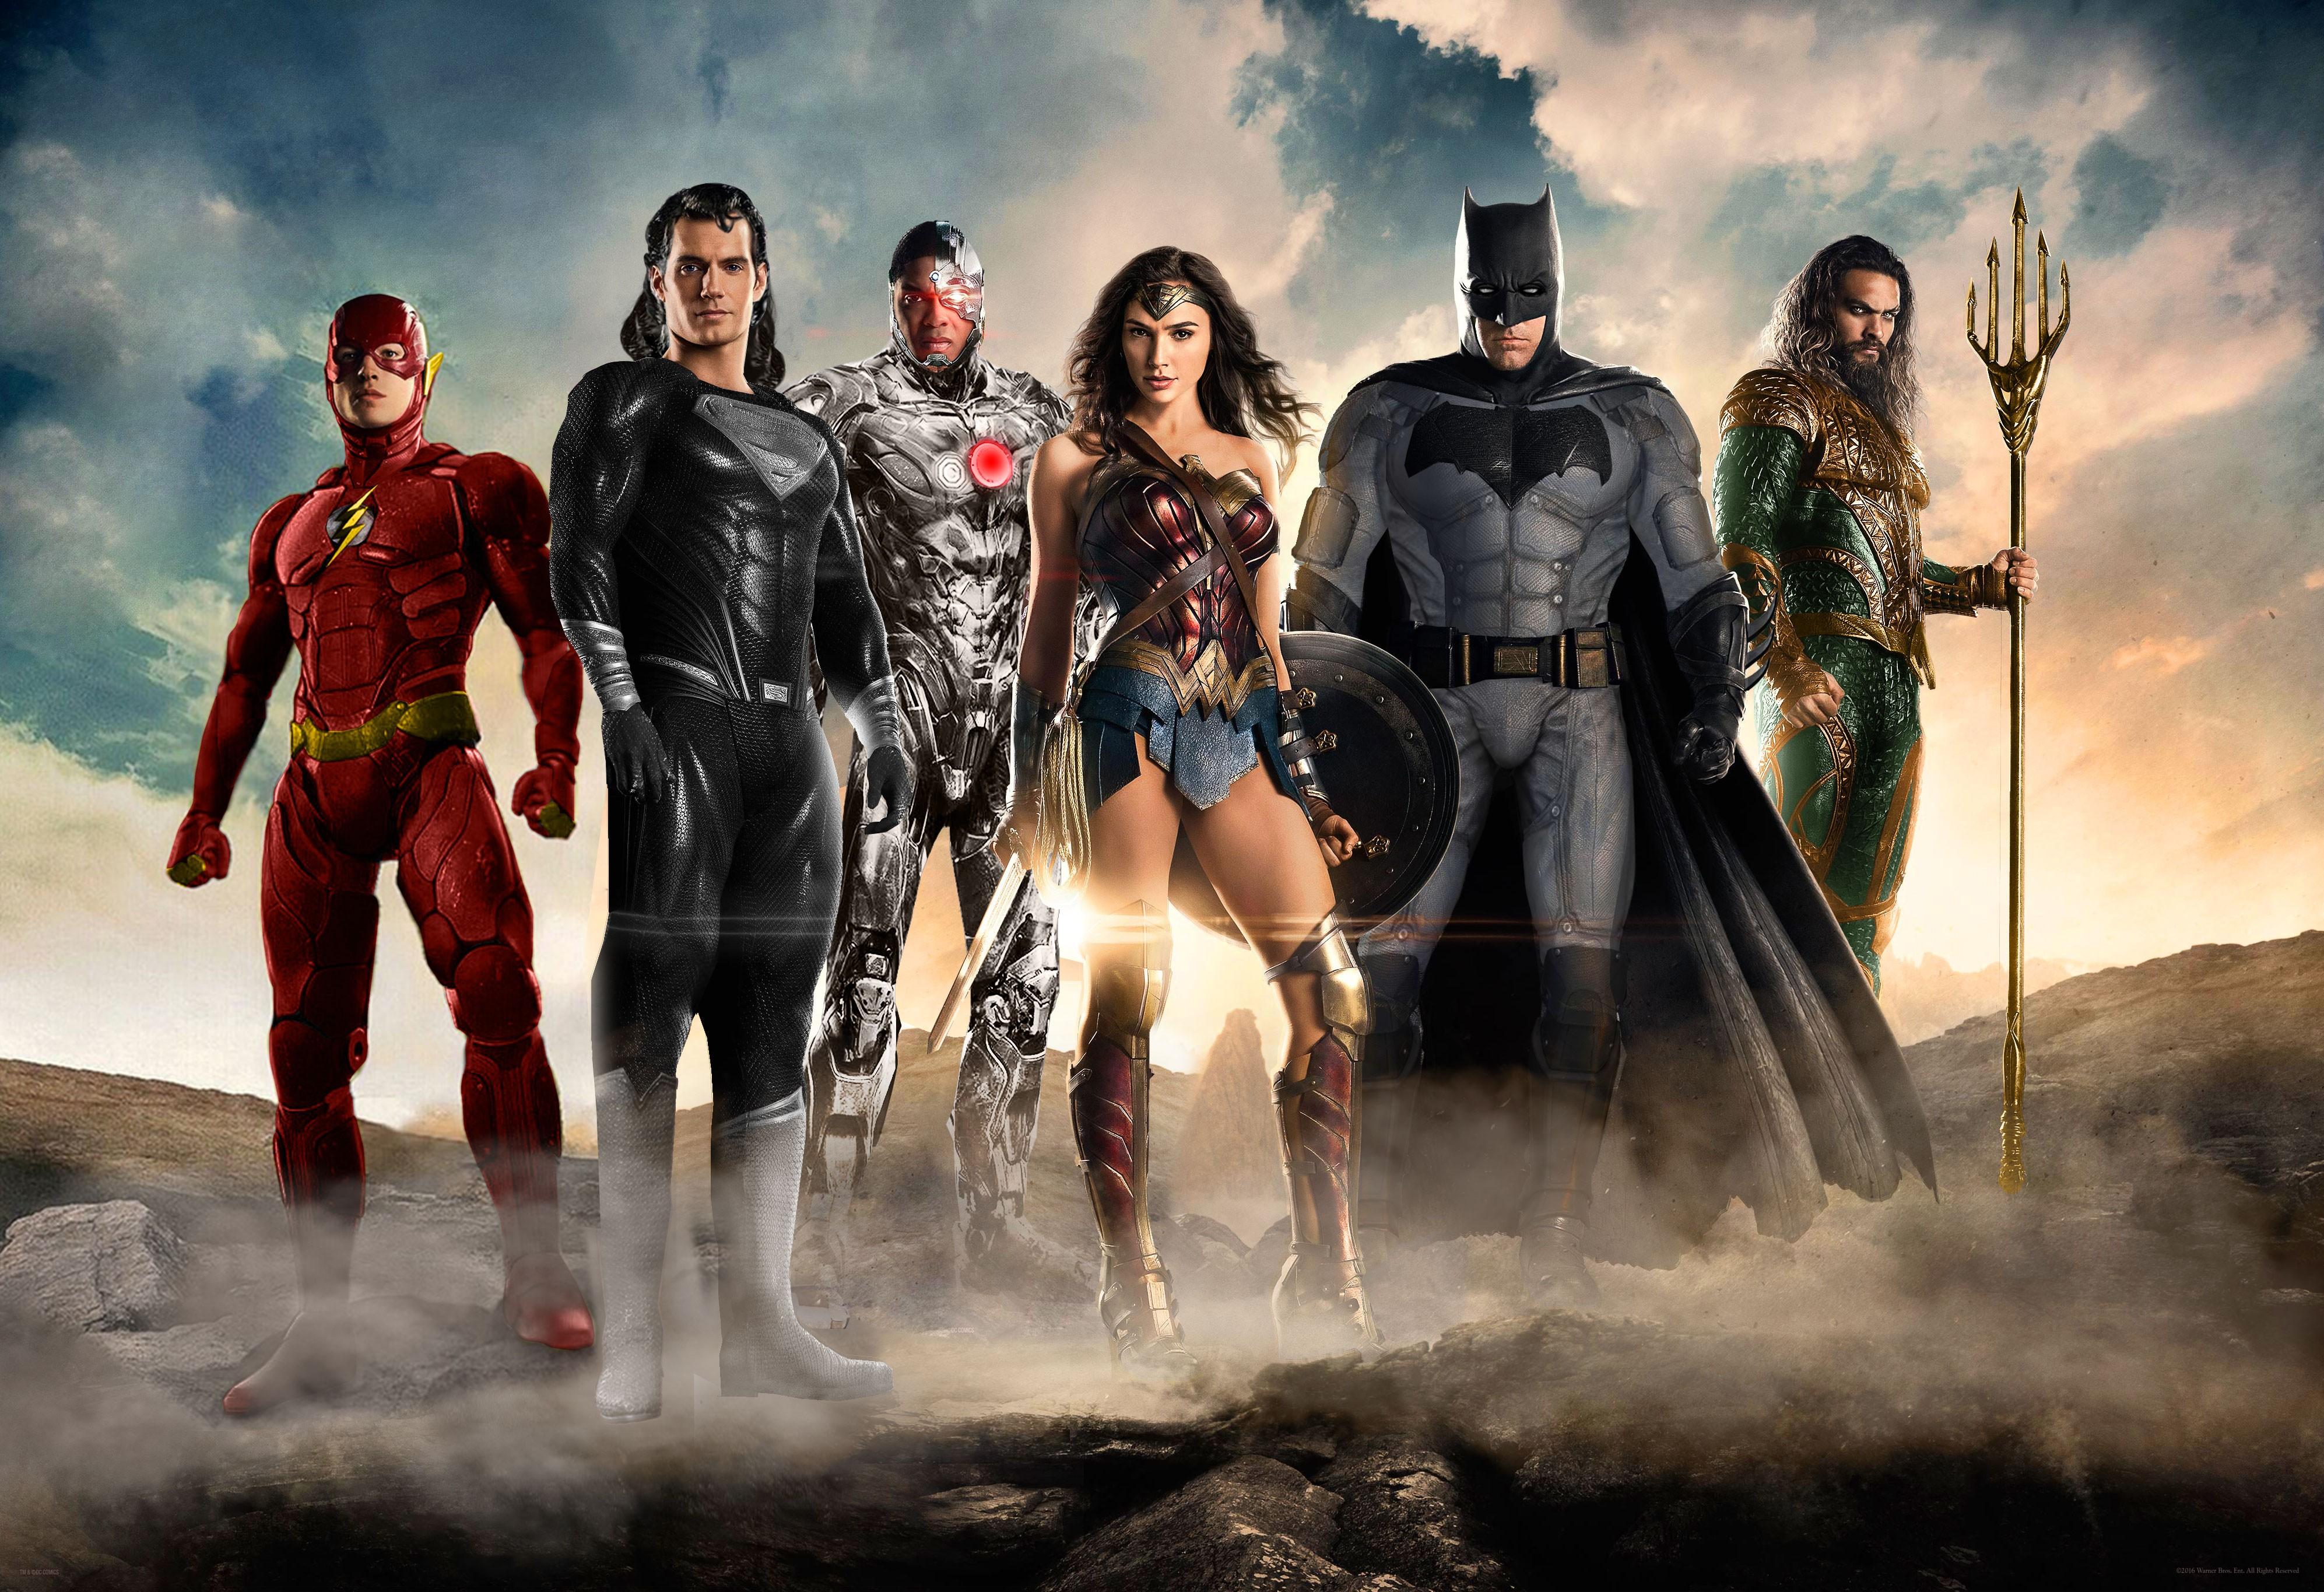 Wallpaper Justice League 2017 Movies Flash Superman: Wallpaper Justice League, Superman, Batman, Wonder Woman